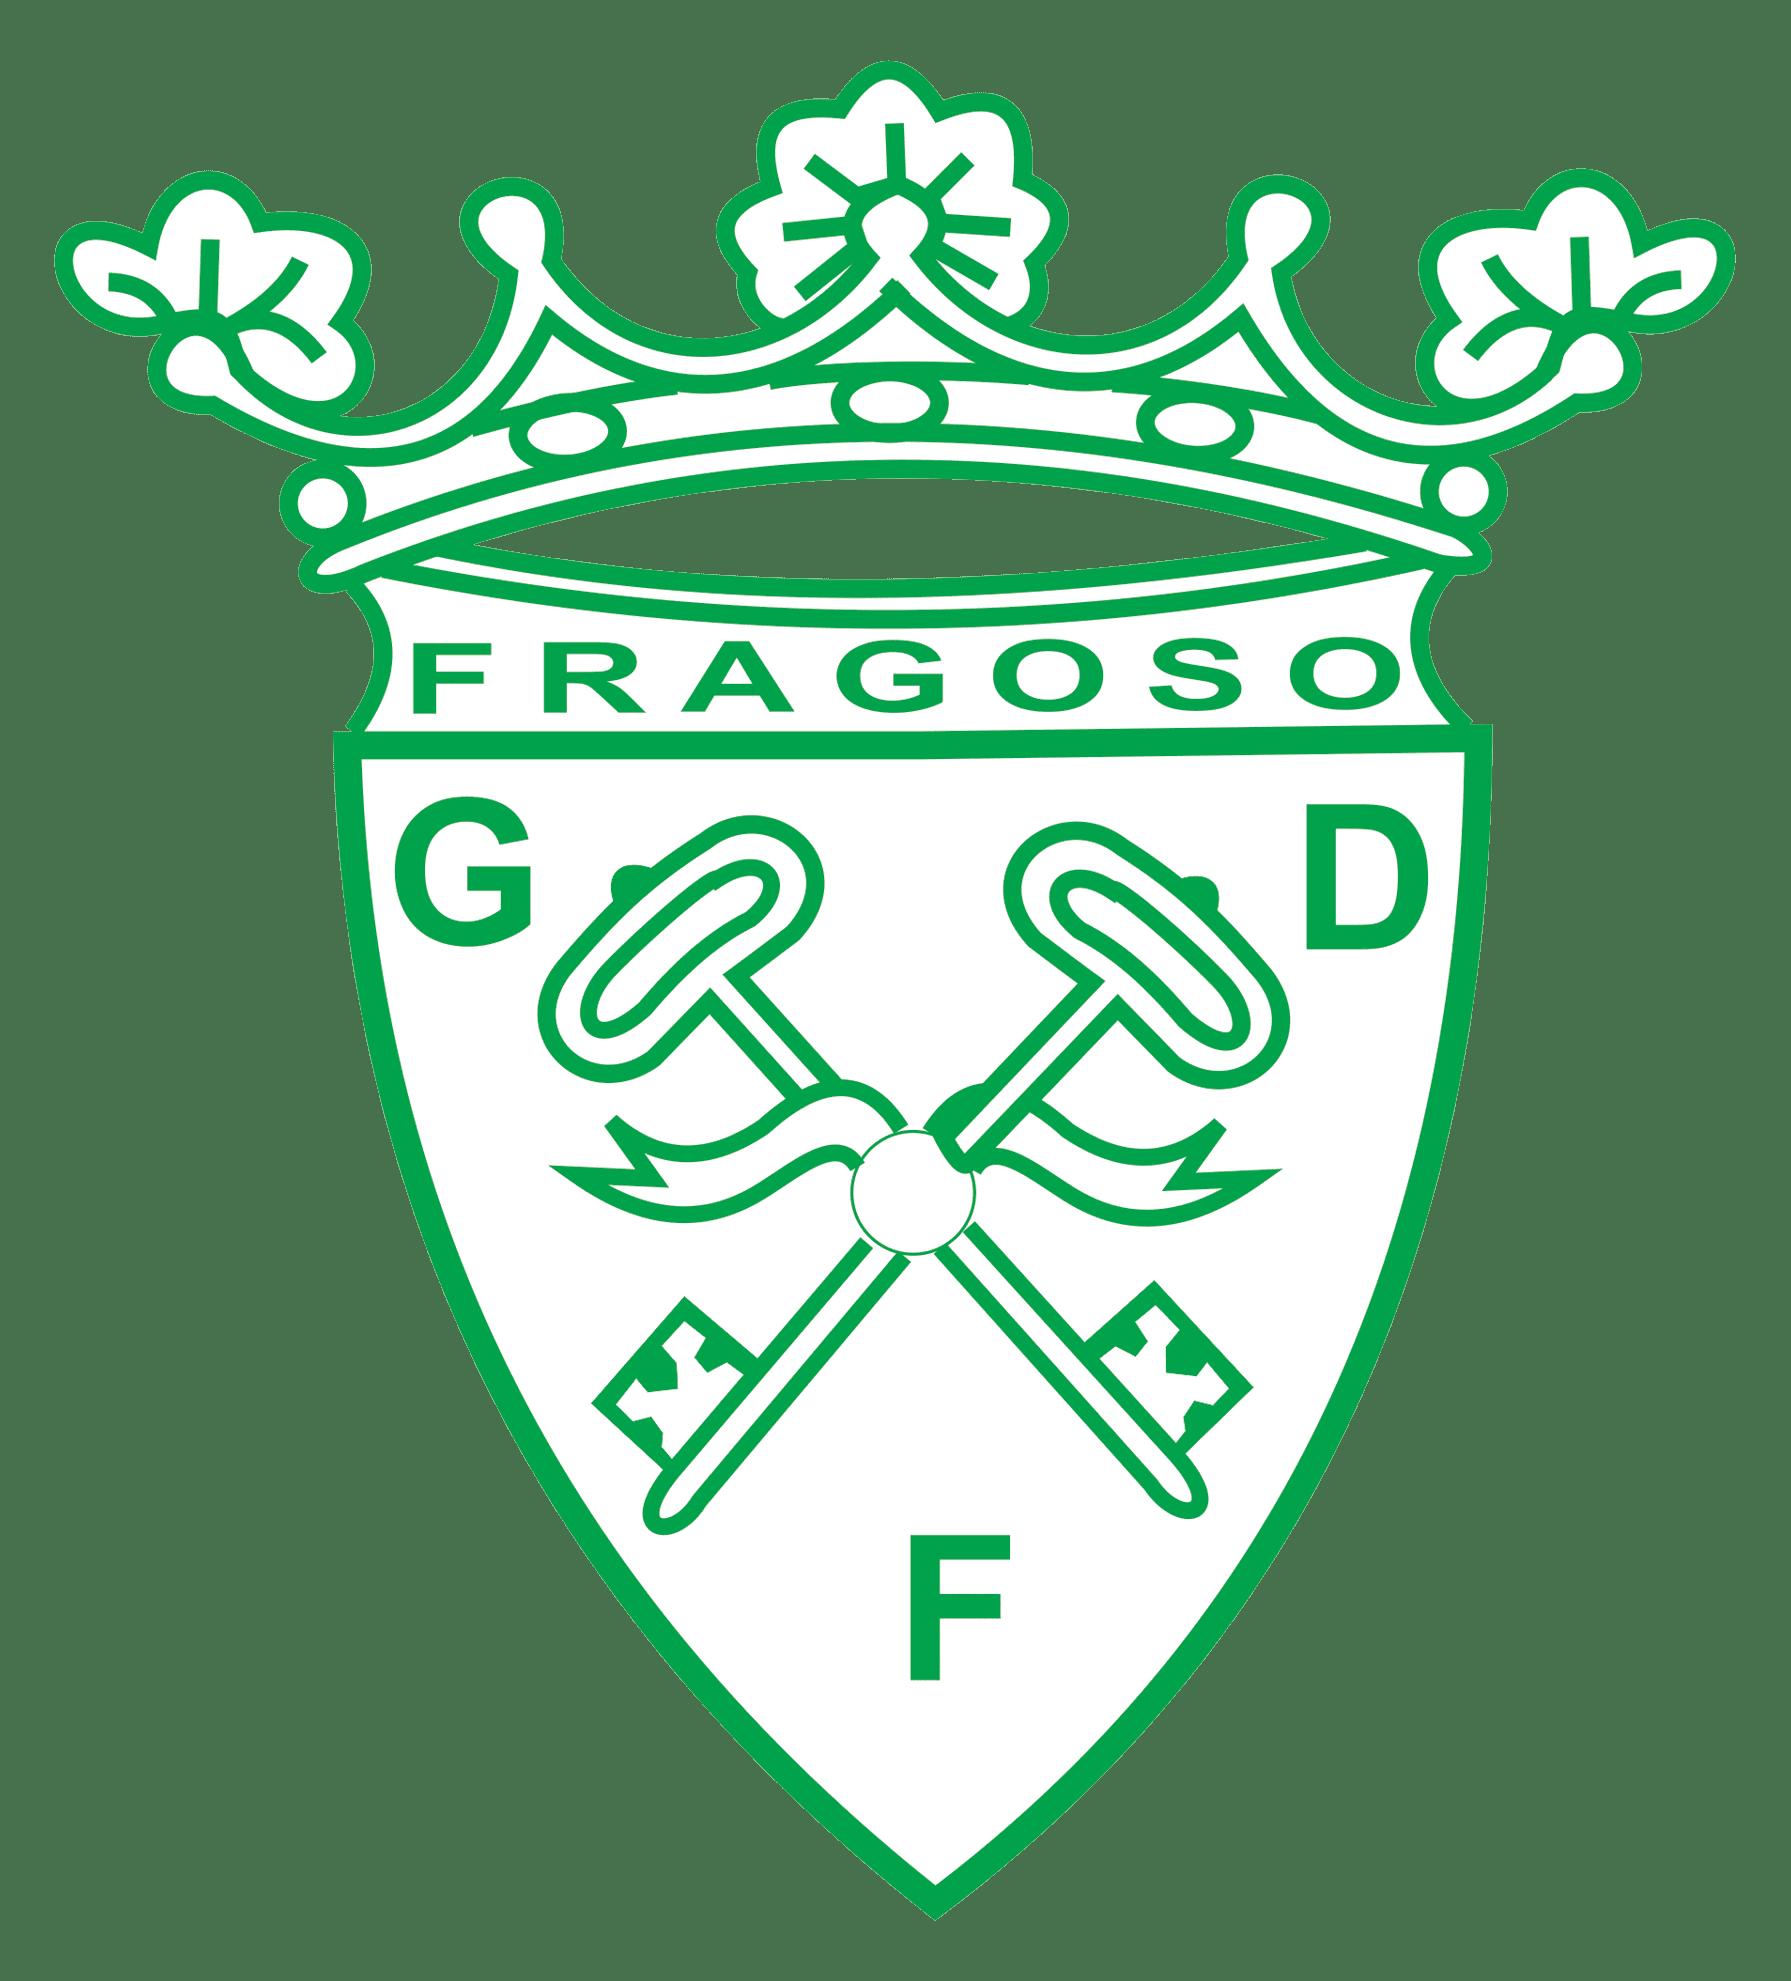 FRAGOSO